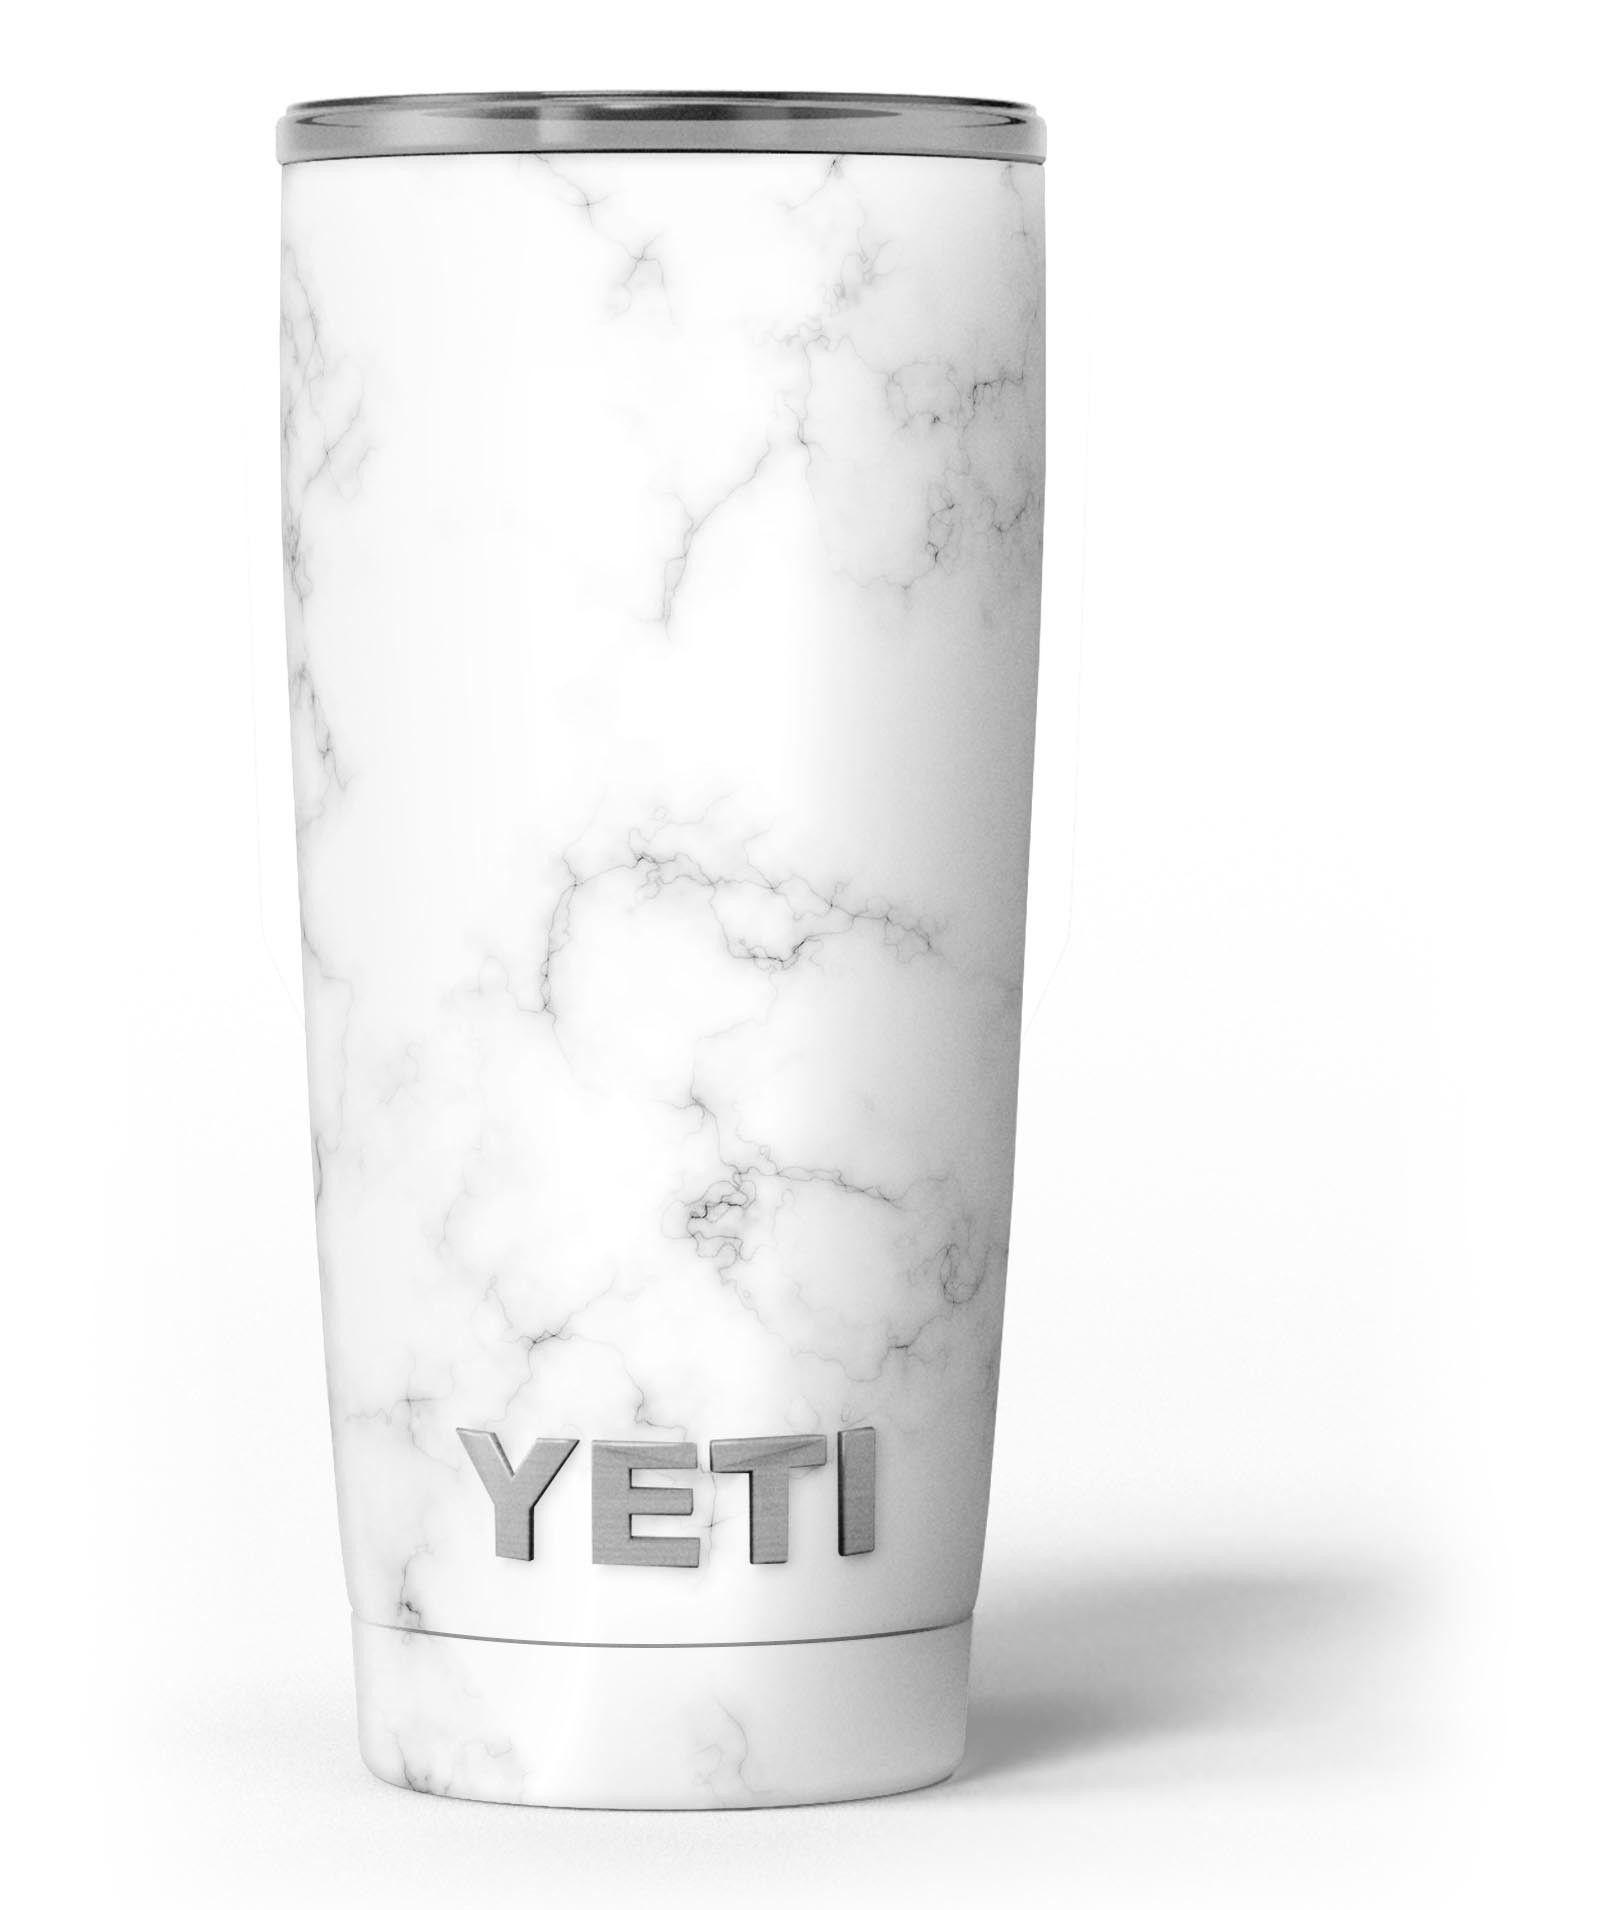 Slate Marble Surface V55 Yeti Rambler Skin Kit From Designskinz